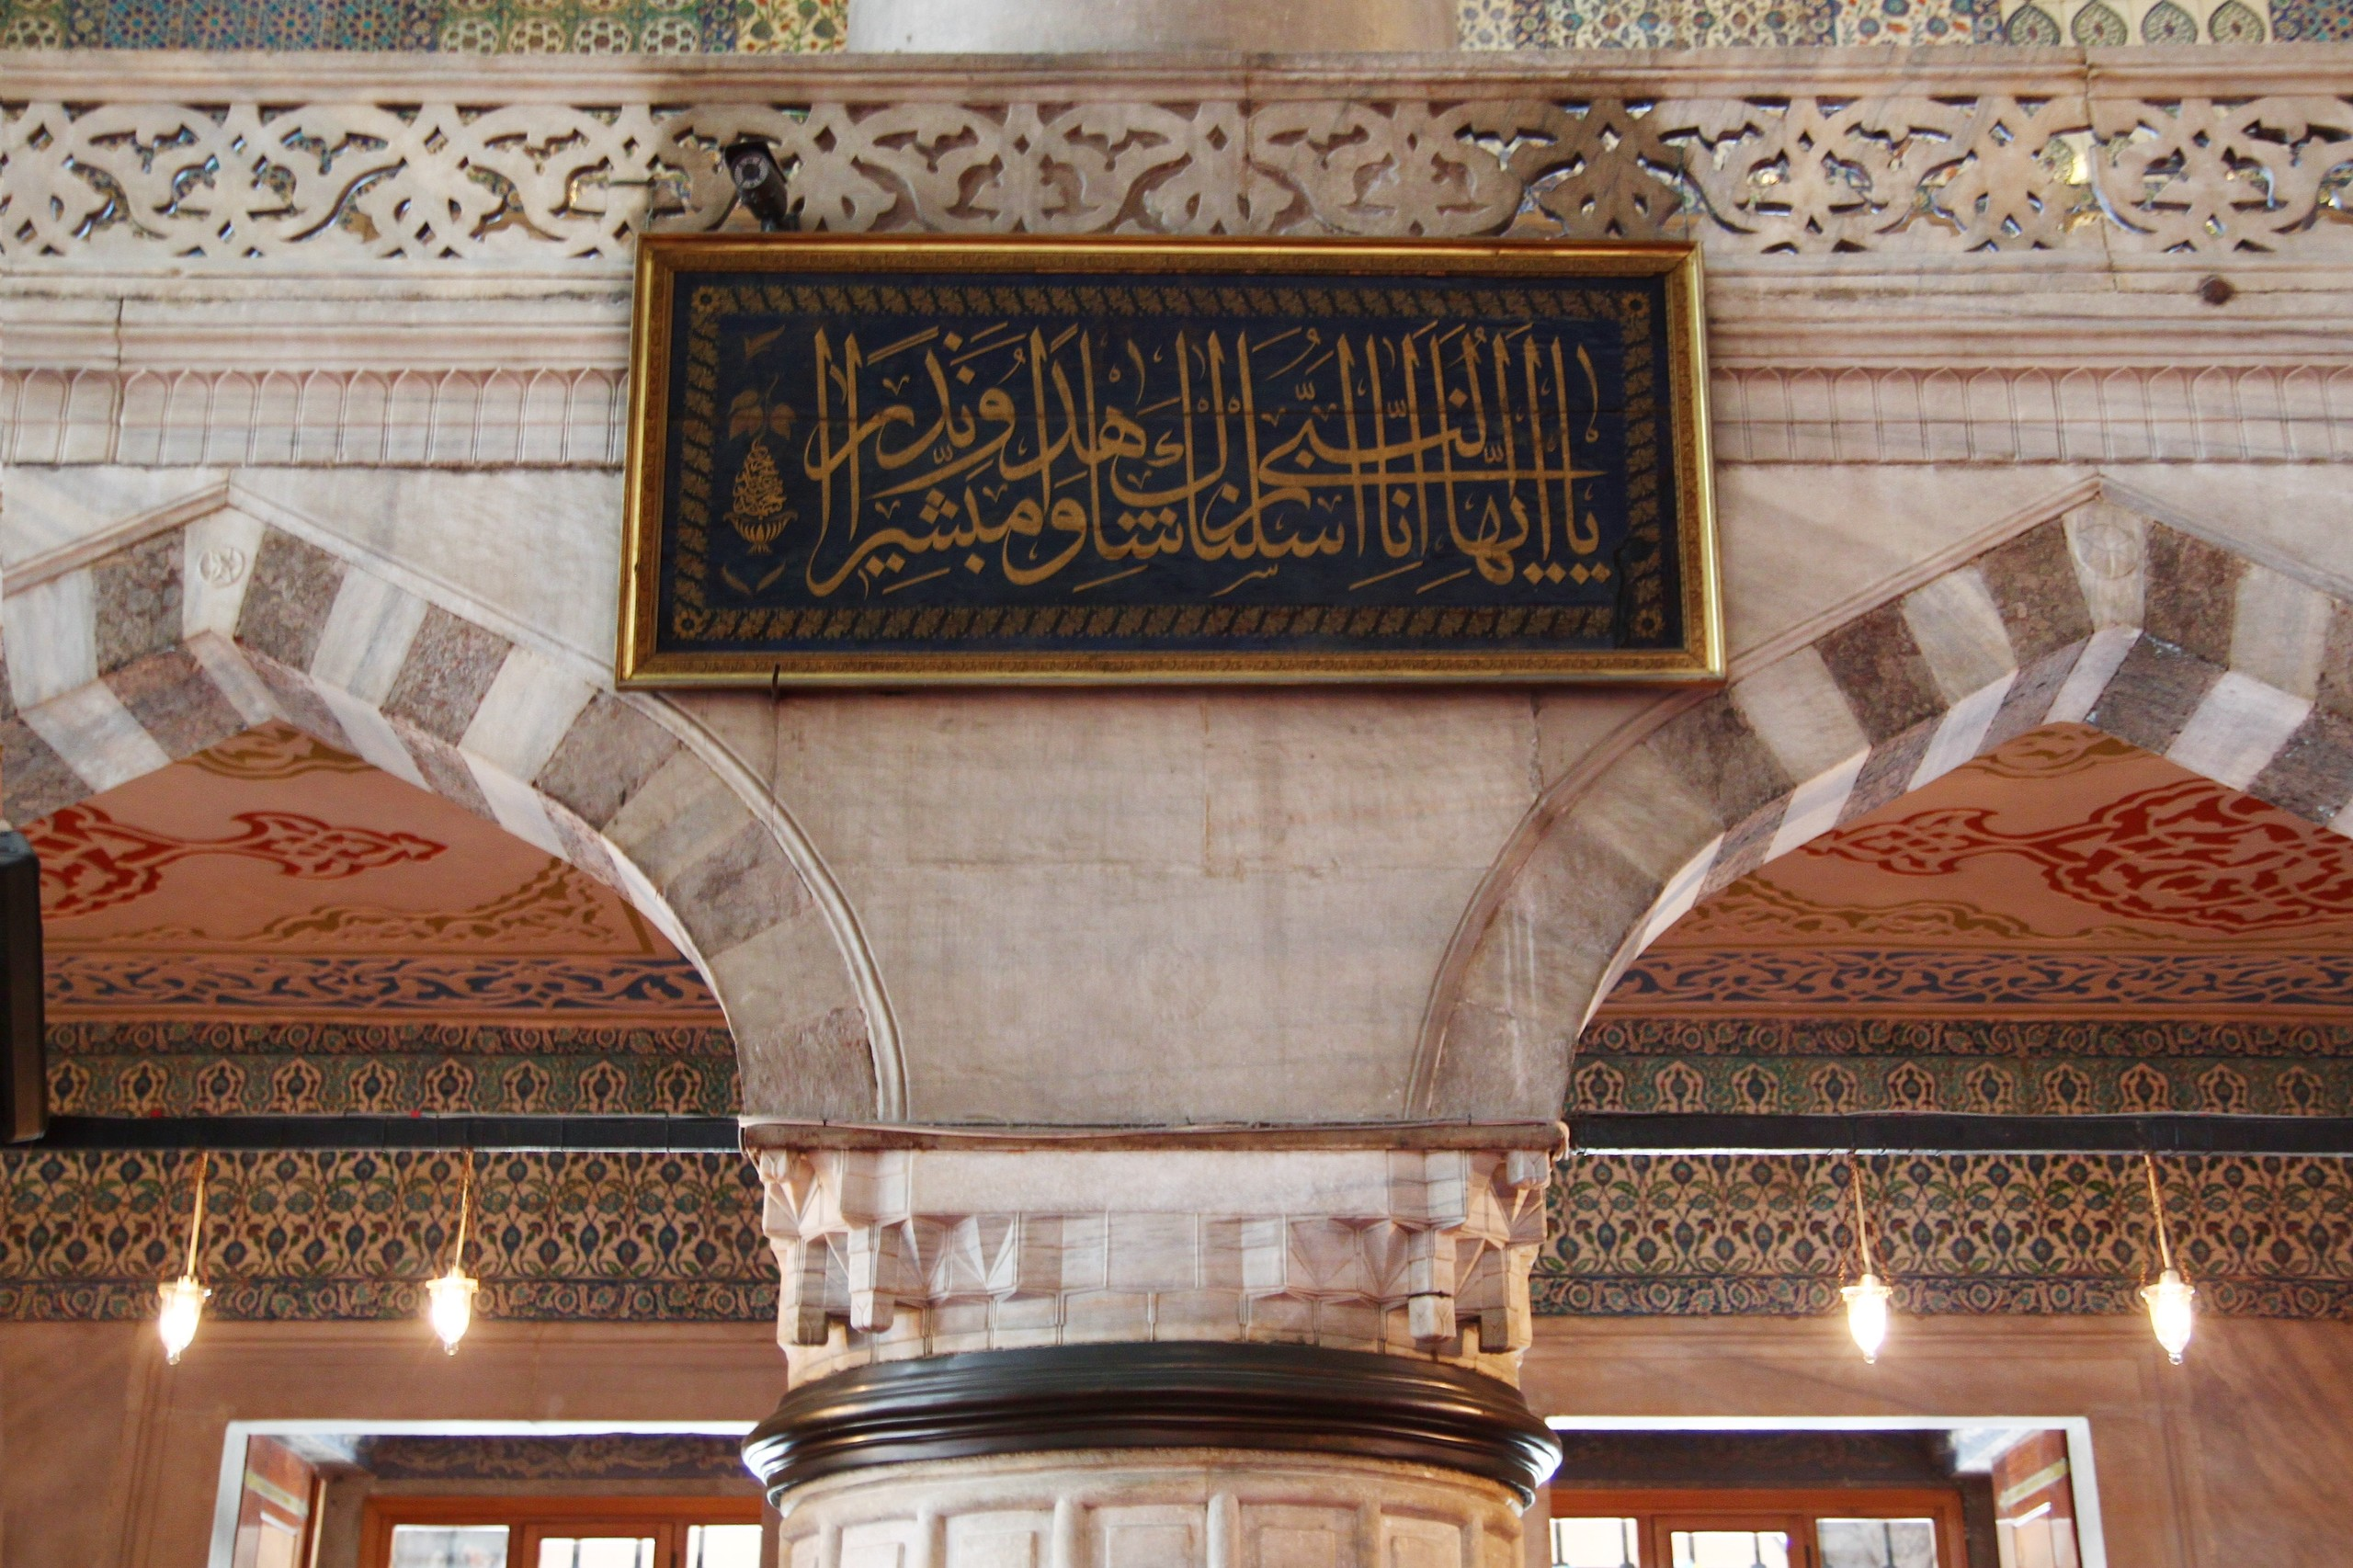 Pırlantadan Kubbeler #5: Sultanahmed - VY8bAR - Pırlantadan Kubbeler #5: Sultanahmed